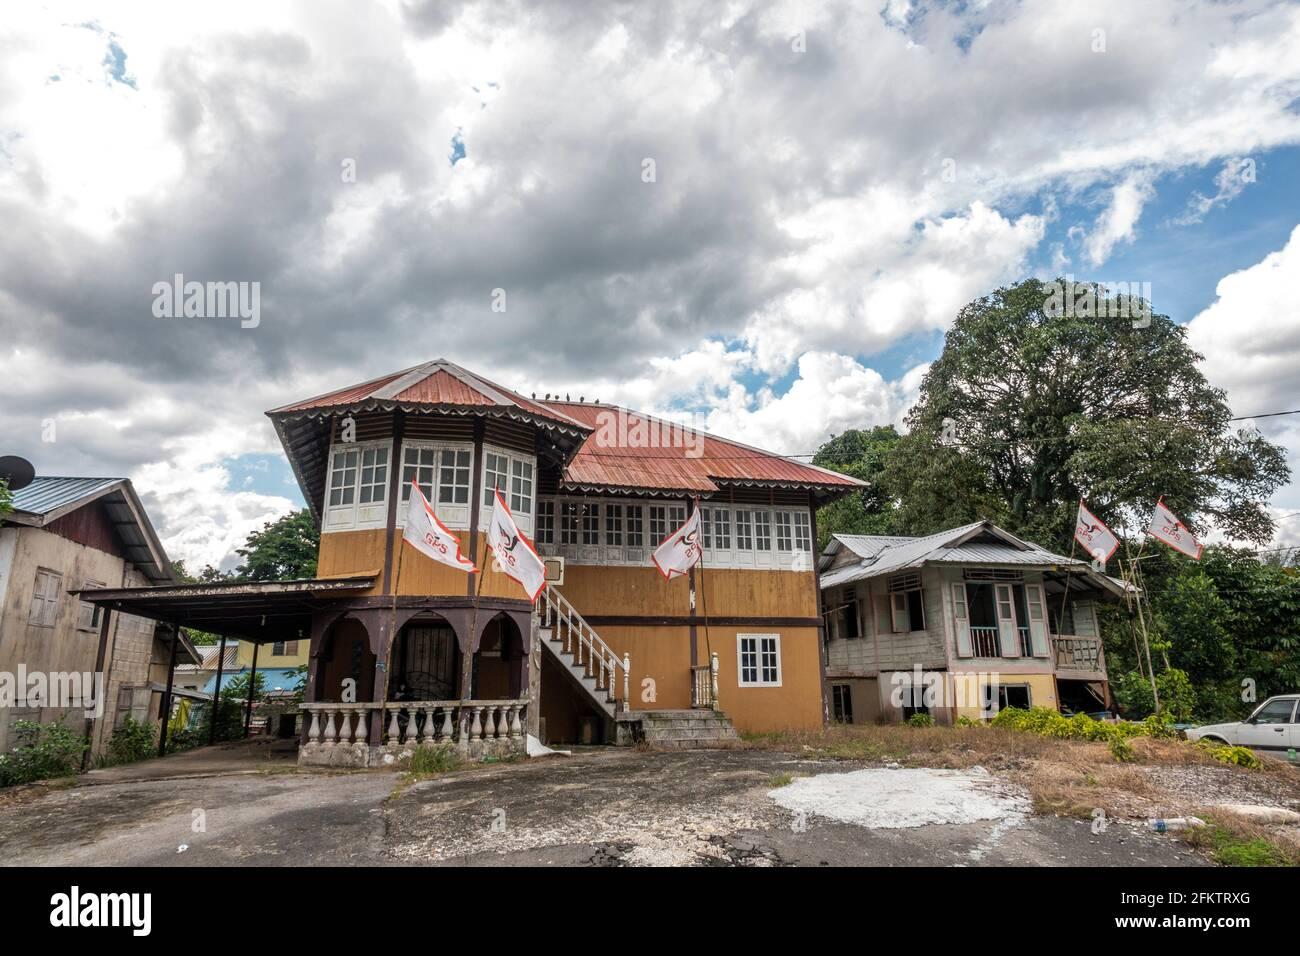 Vecchia casa bungalow in legno a Buso, Bau, Sarawak, Malesia orientale Foto Stock